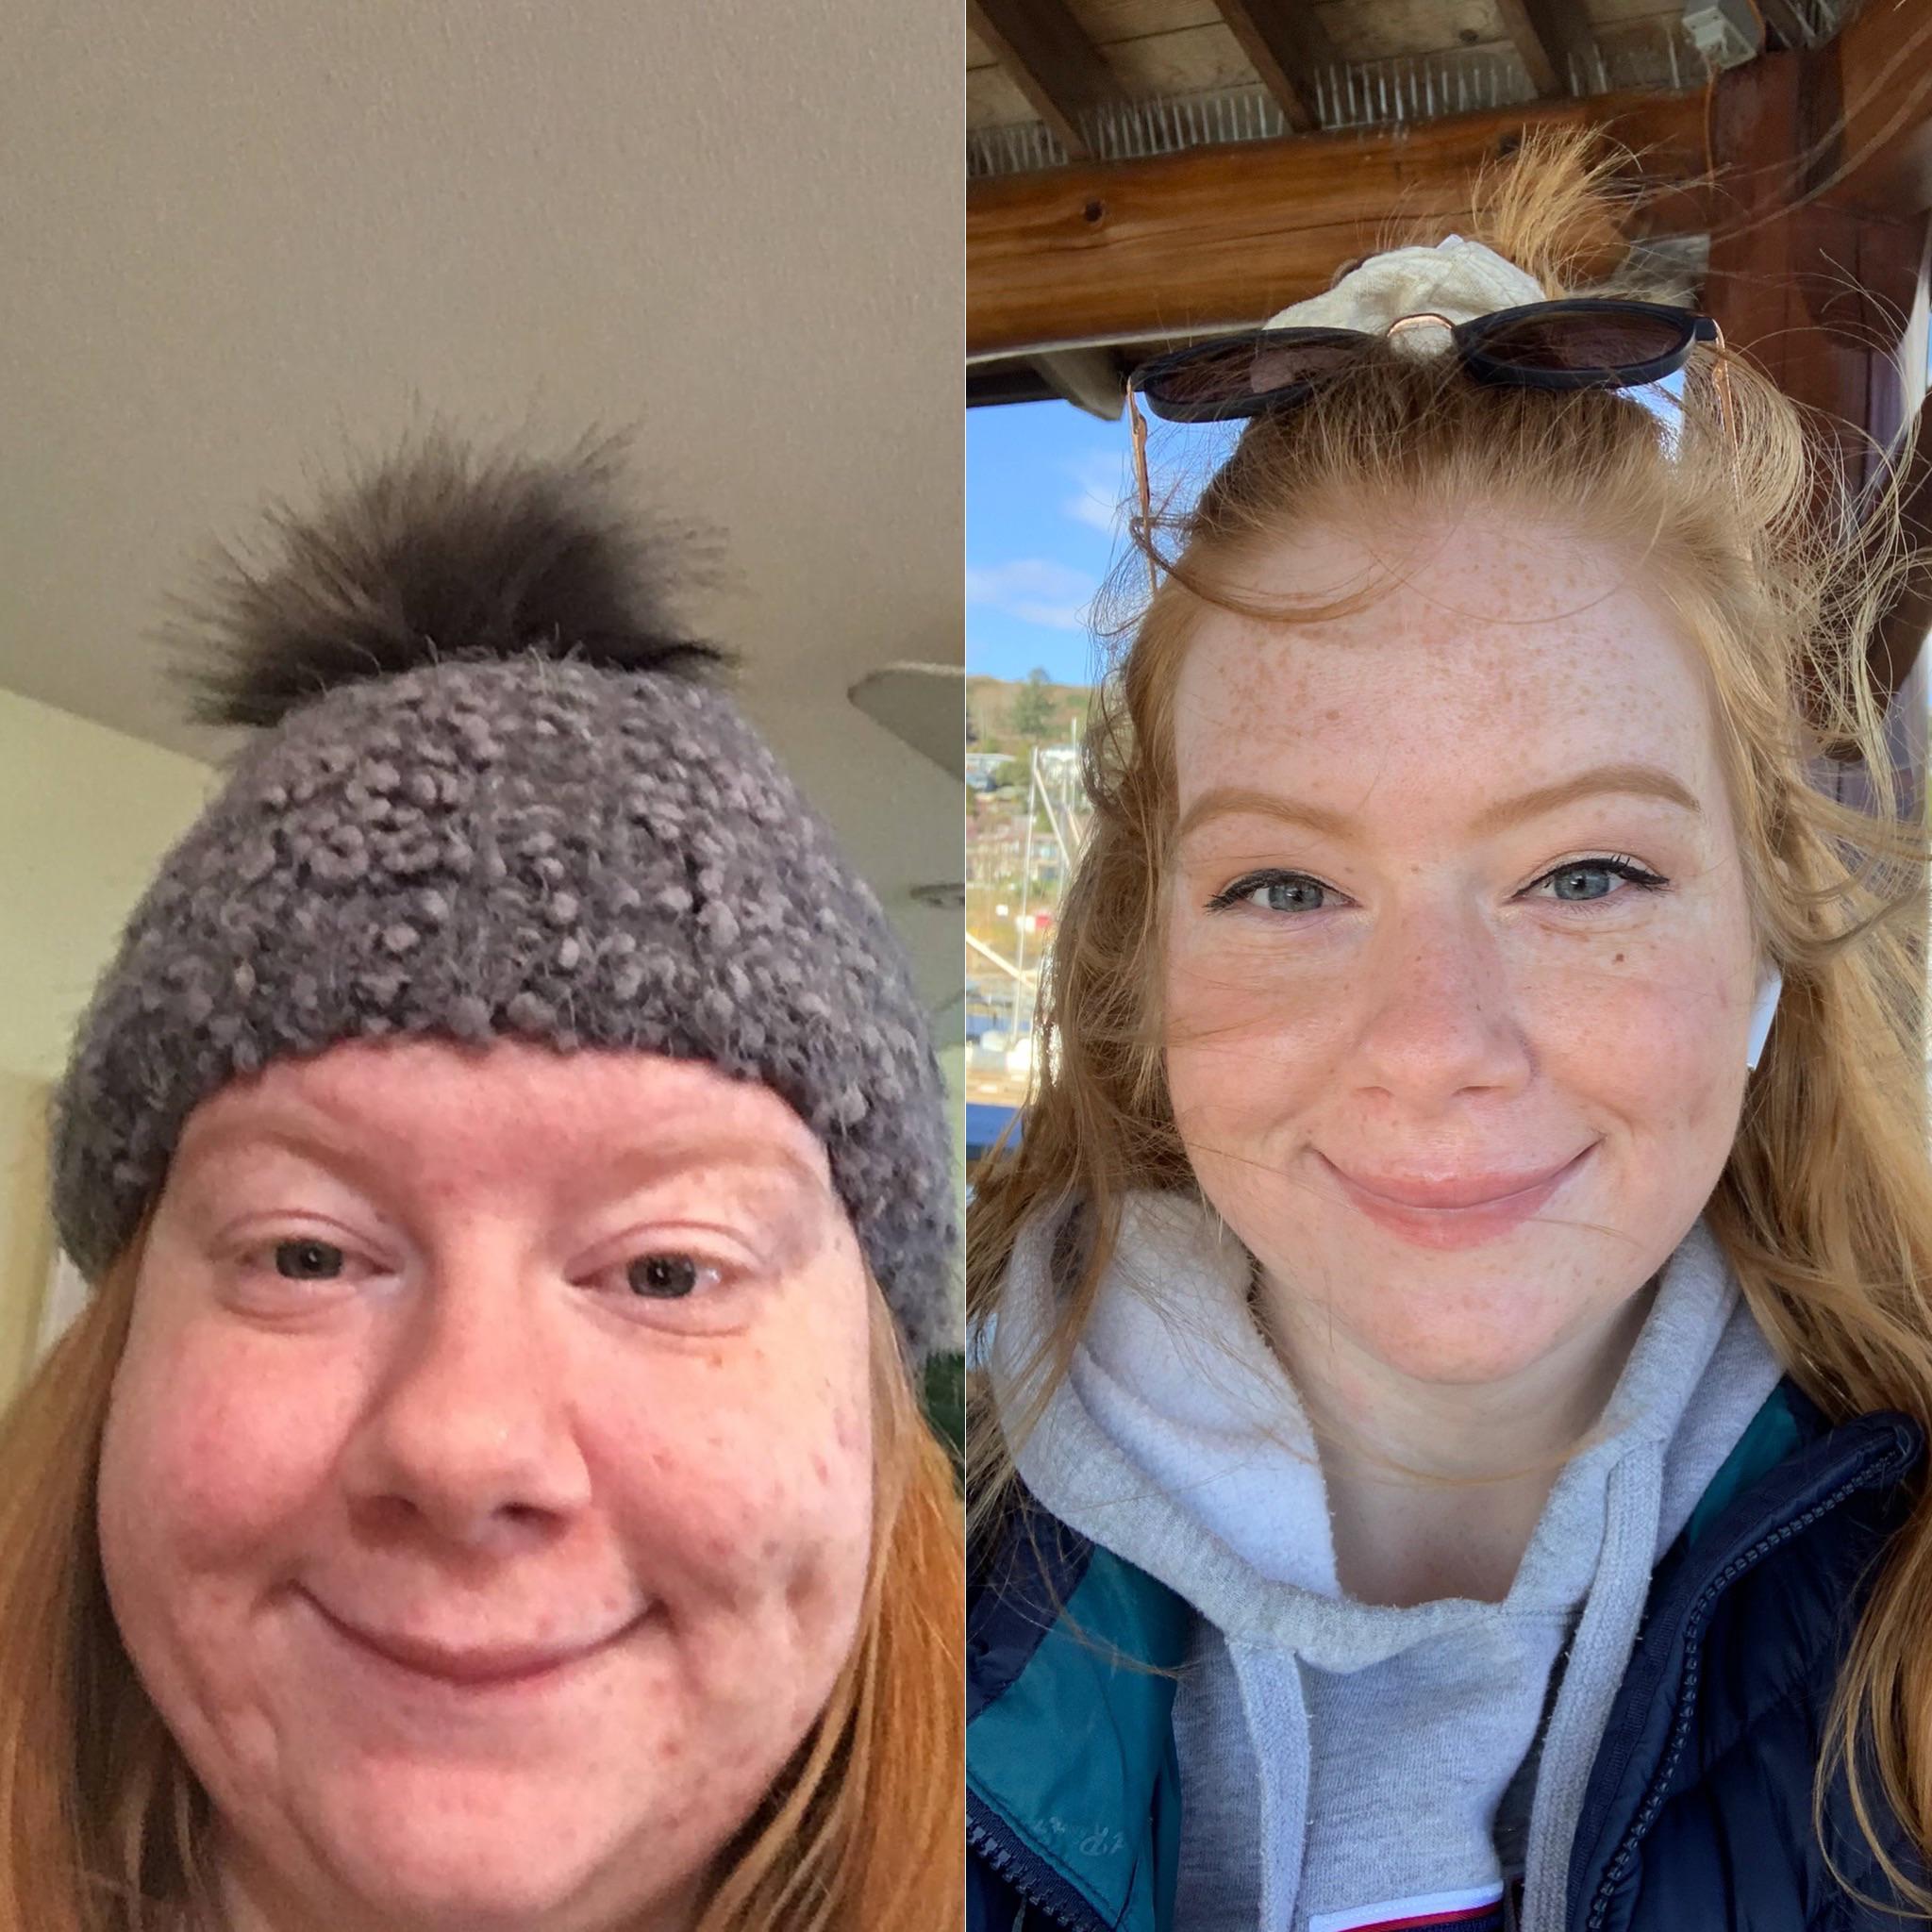 5'5 Female Progress Pics of 61 lbs Weight Loss 190 lbs to 129 lbs